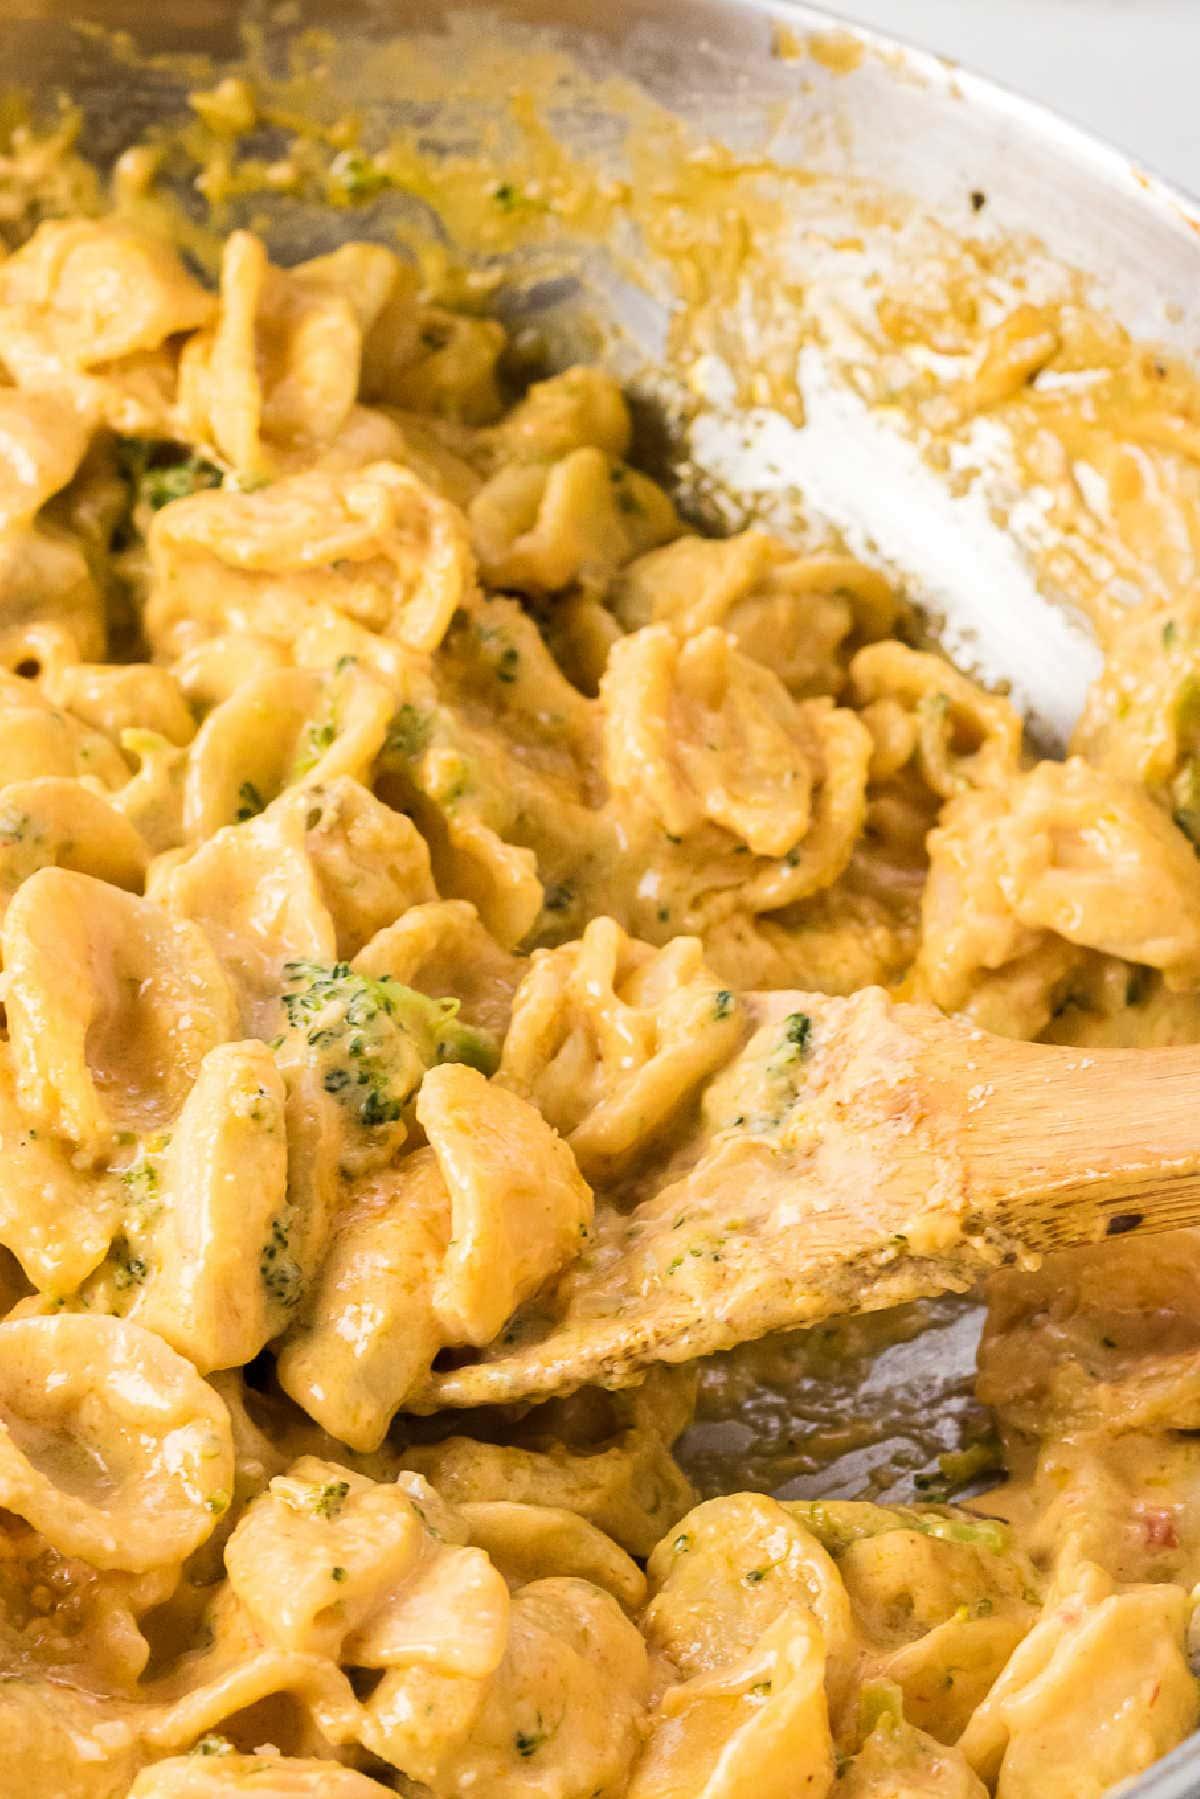 Closeup of pasta with broccoli.